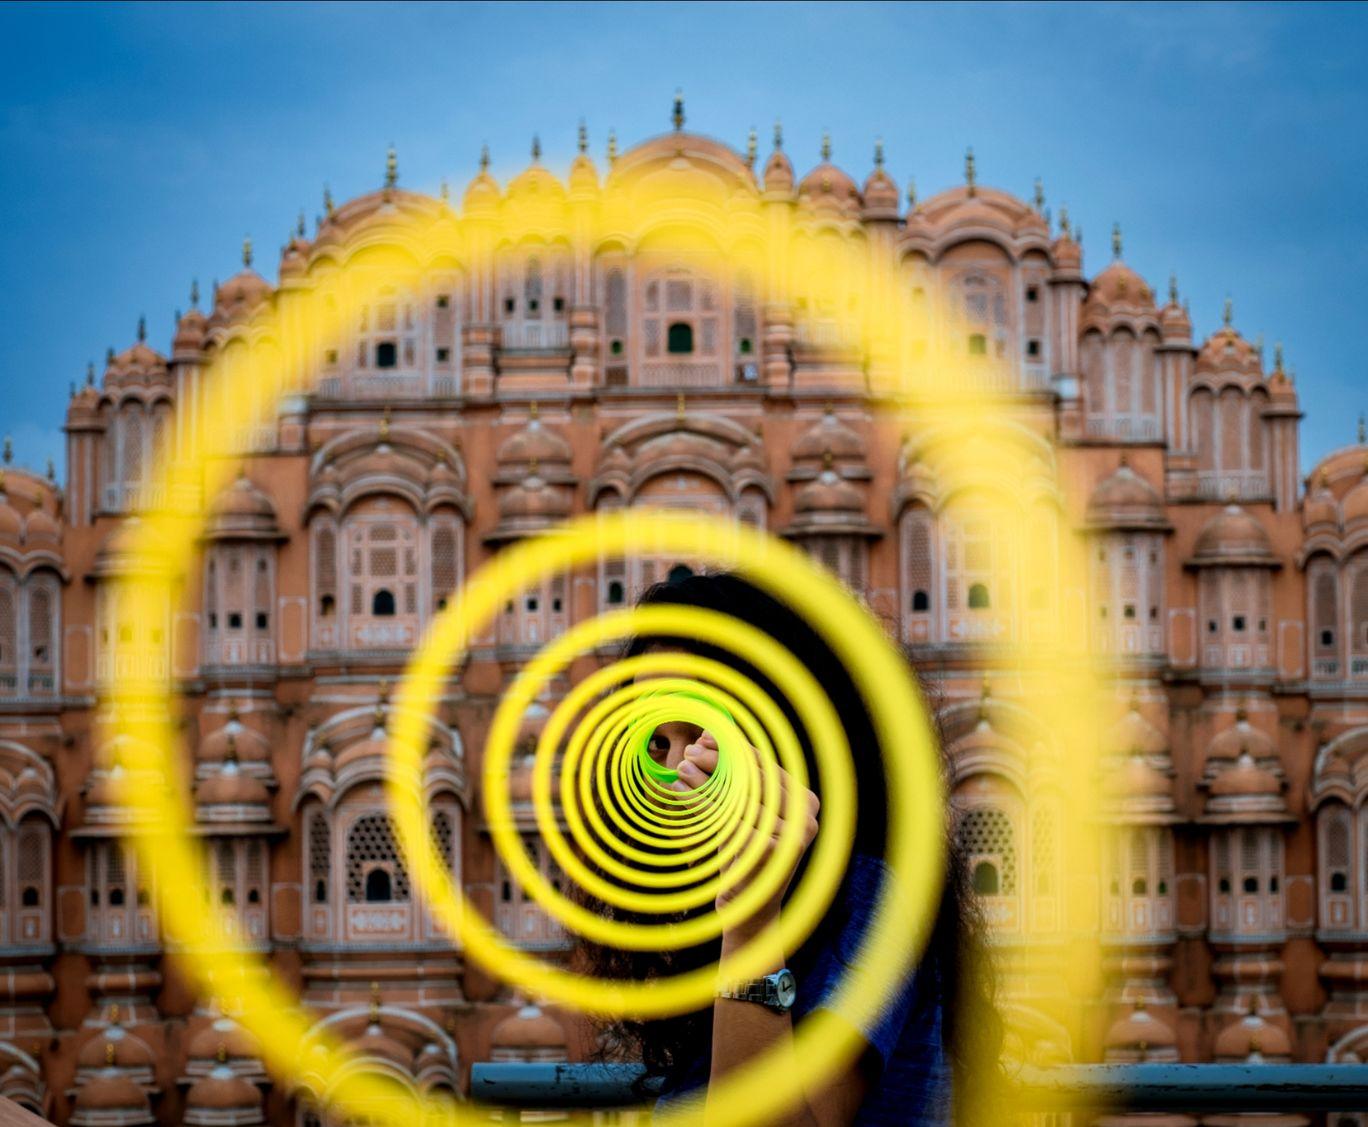 Photo of Hawa Mahal - Palace of Wind By Aarti Vijay Photography